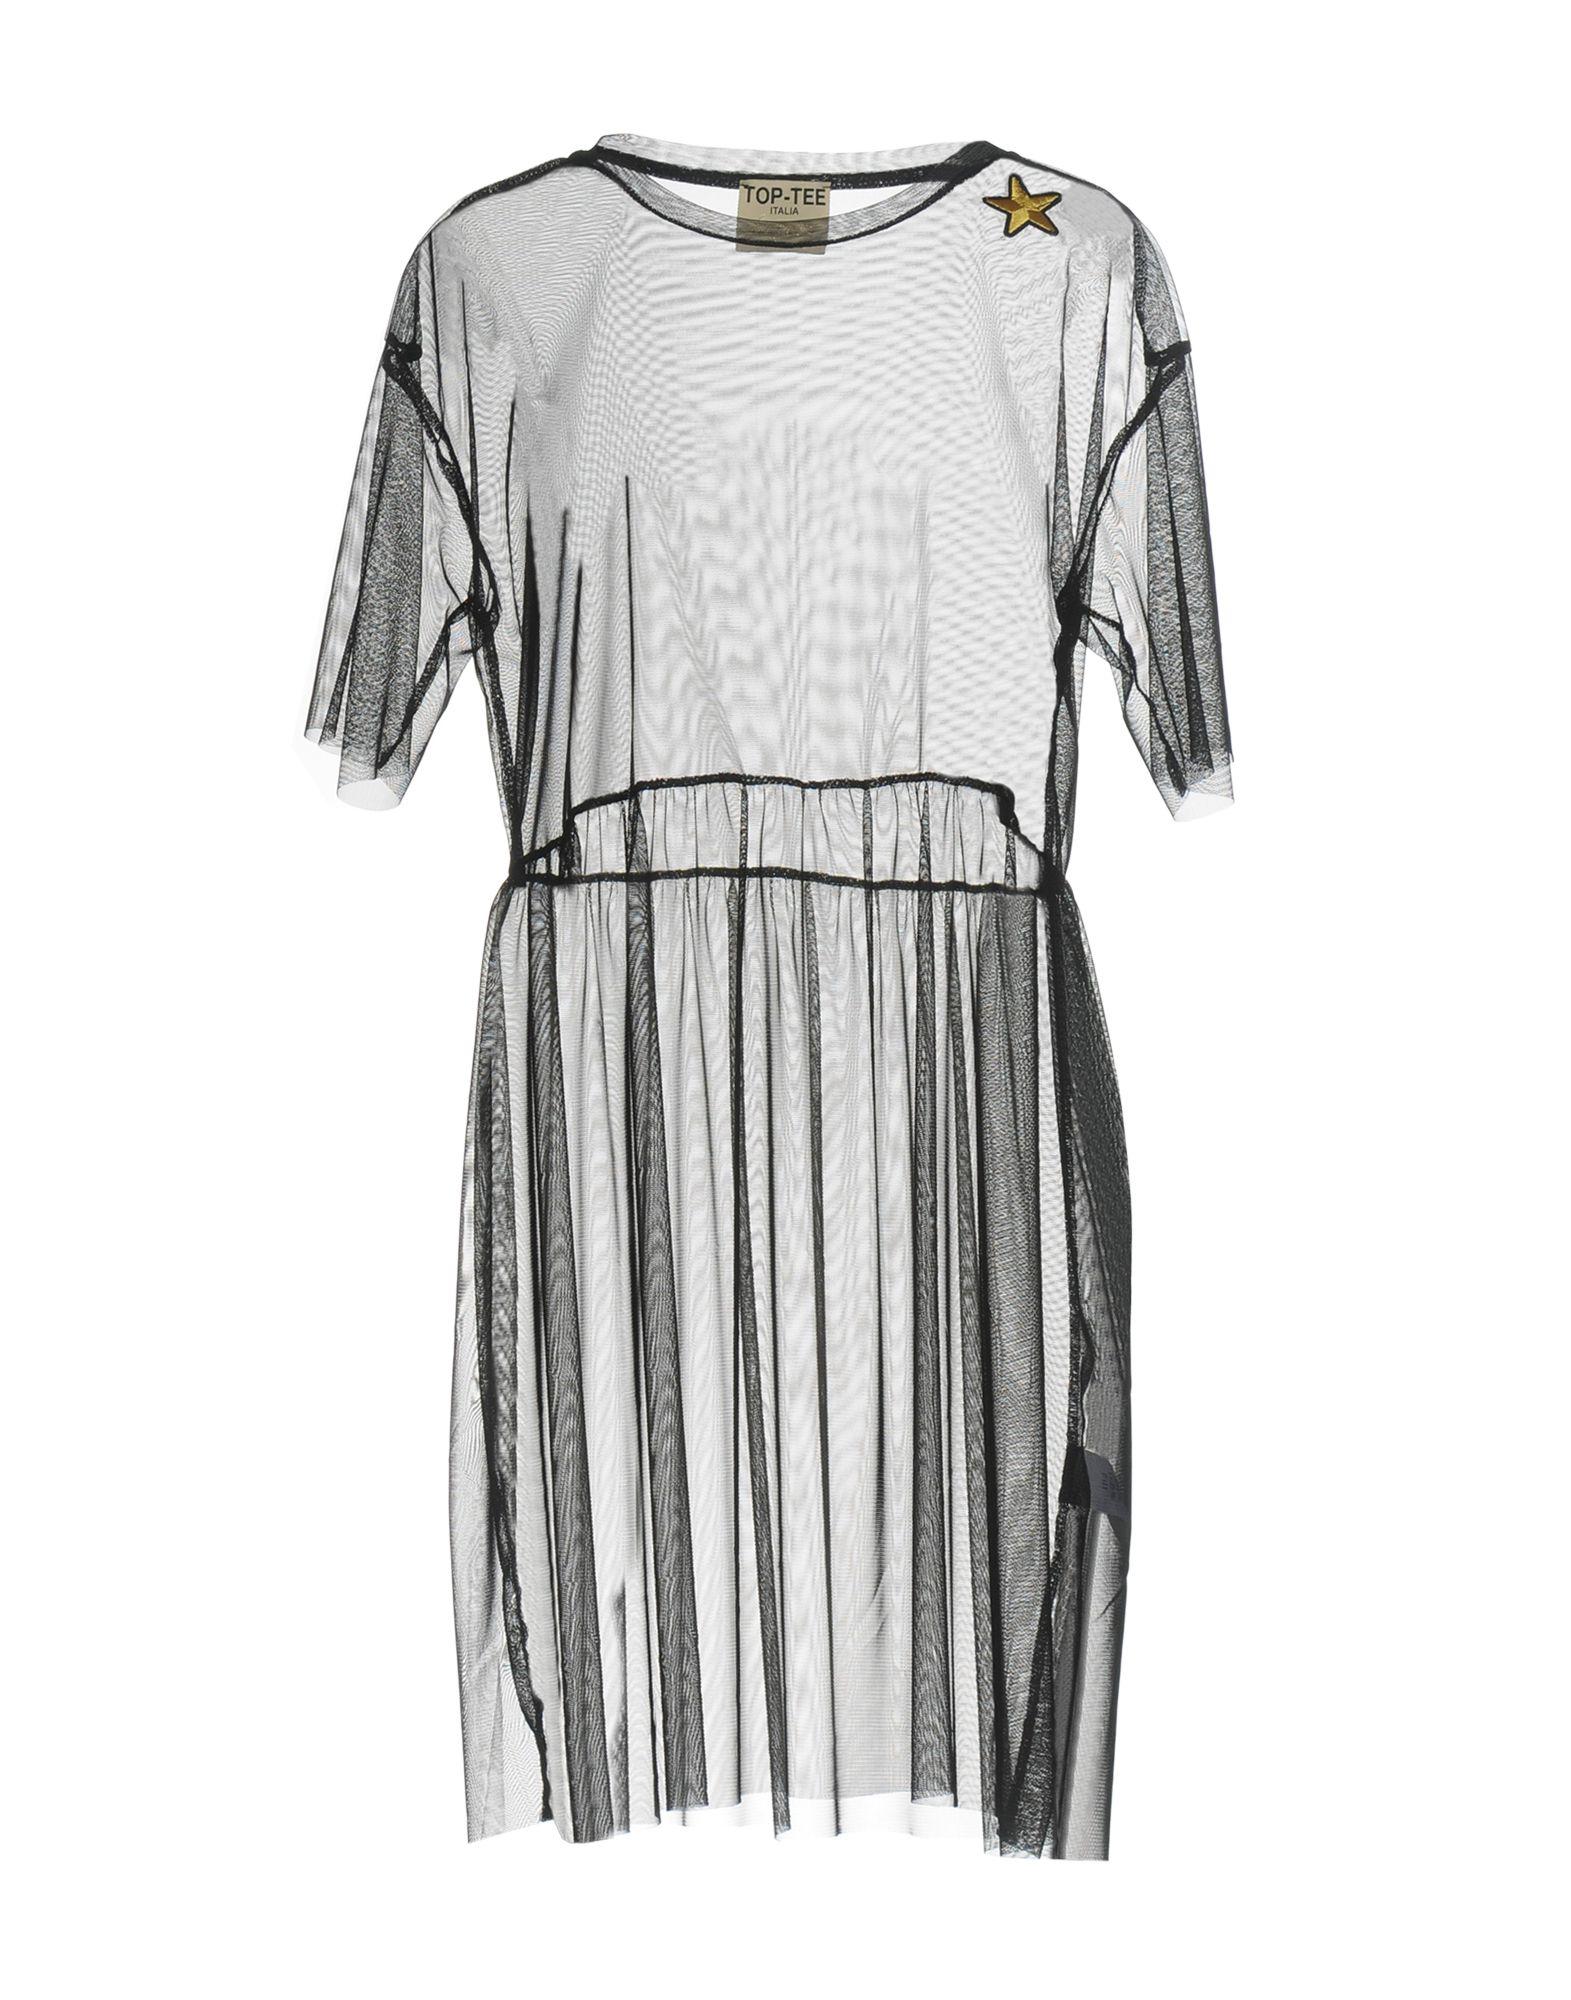 TOP-TEE Короткое платье lace up sheer mesh tee with tank top